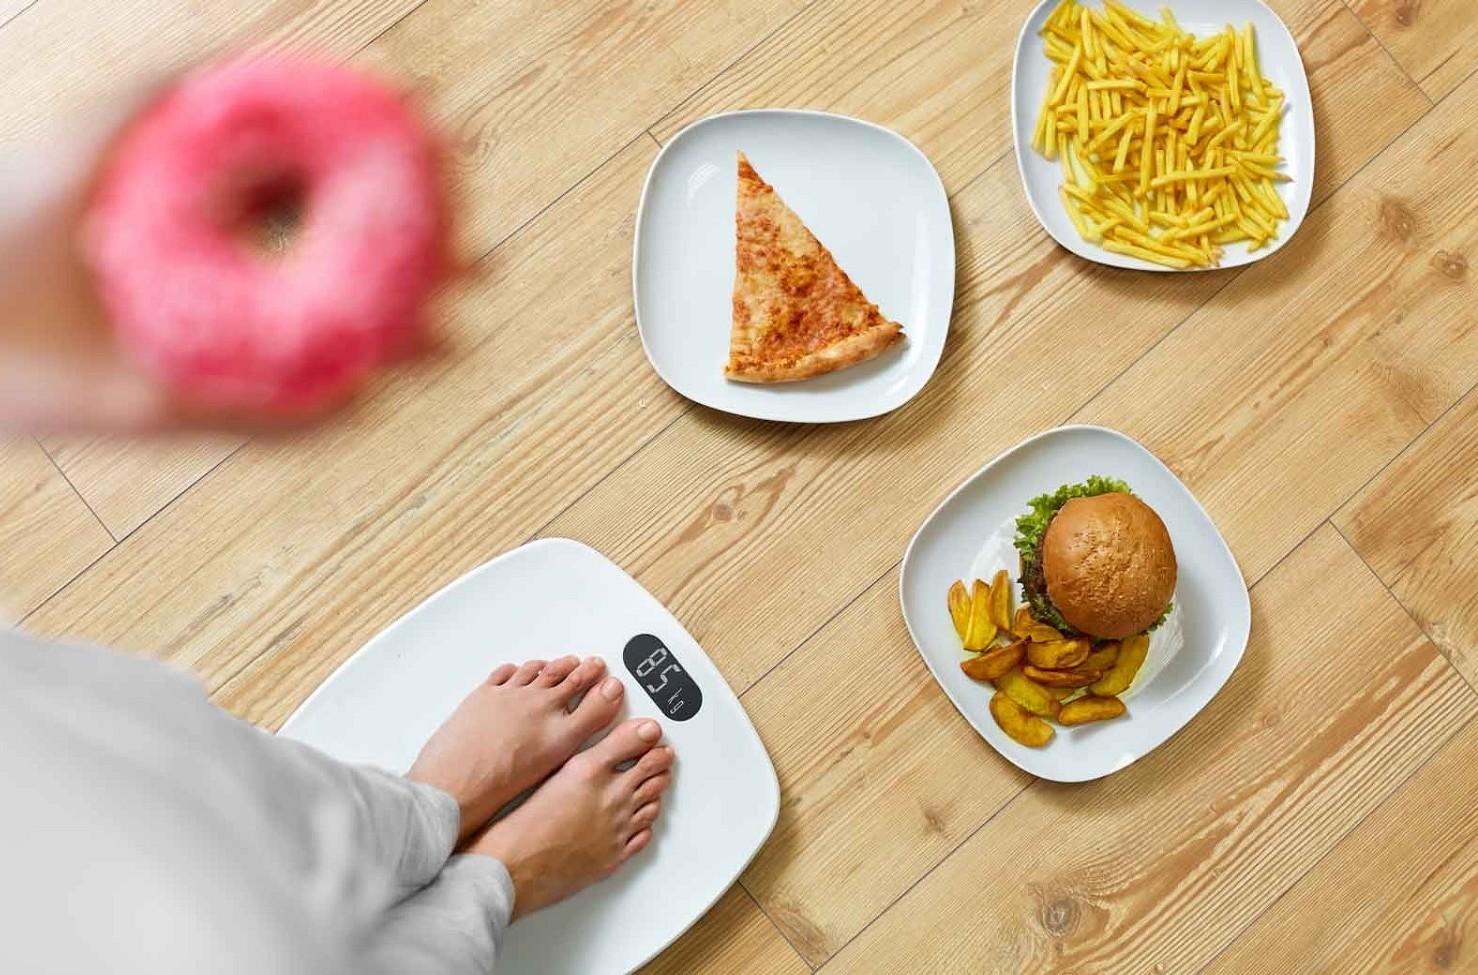 Dieta: eliminare gli zuccheri per dimagr